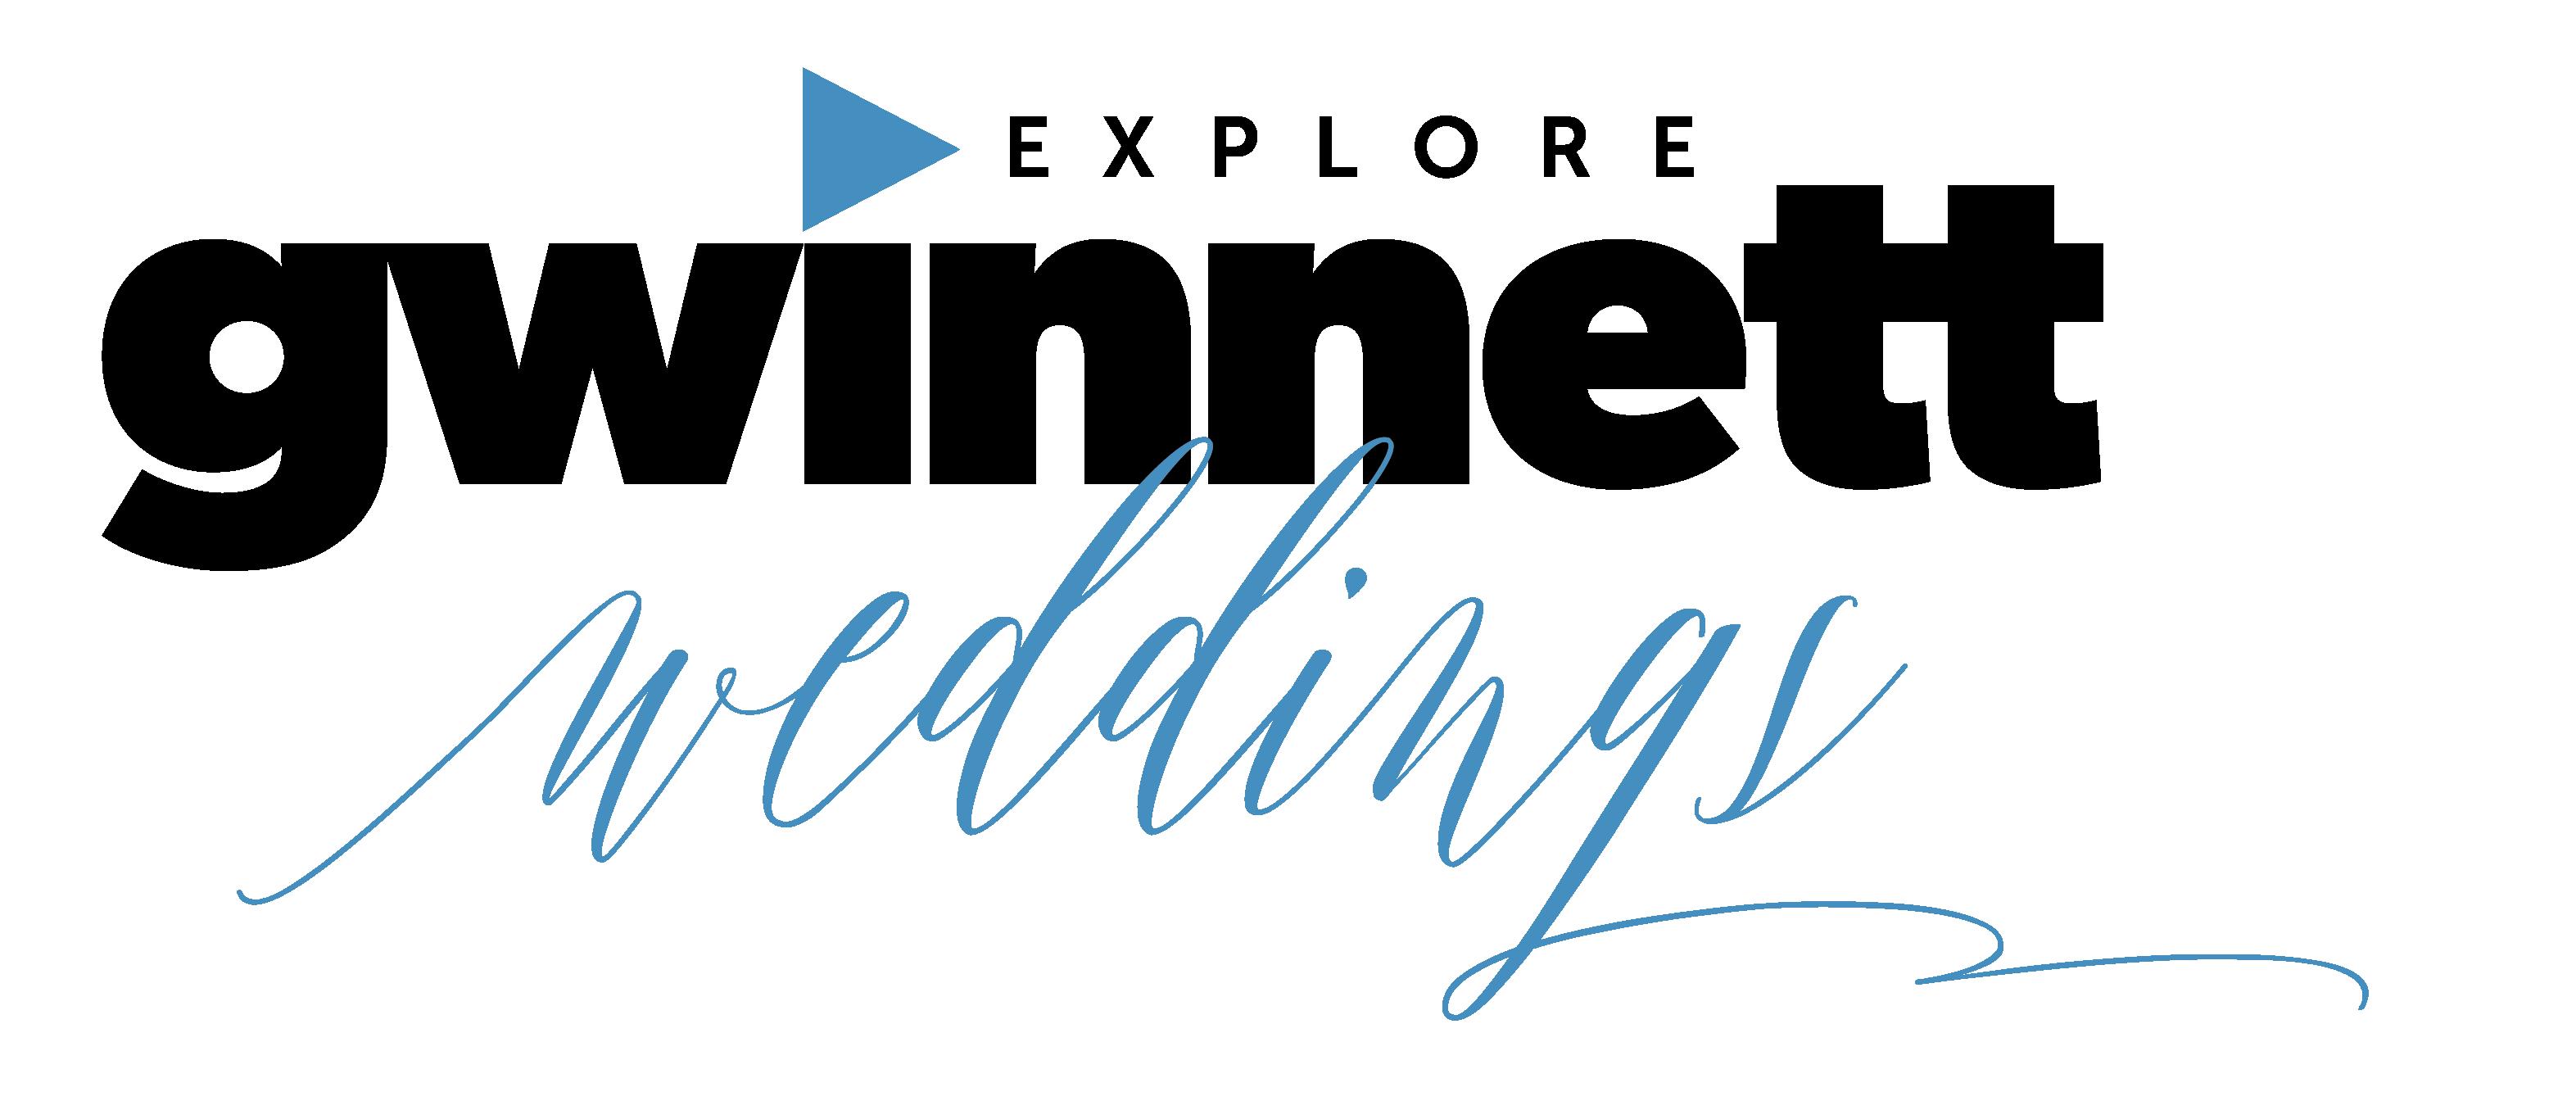 EGLogo-BlueBlack-Weddings-01.png?mtime=20190122073239#asset:61343